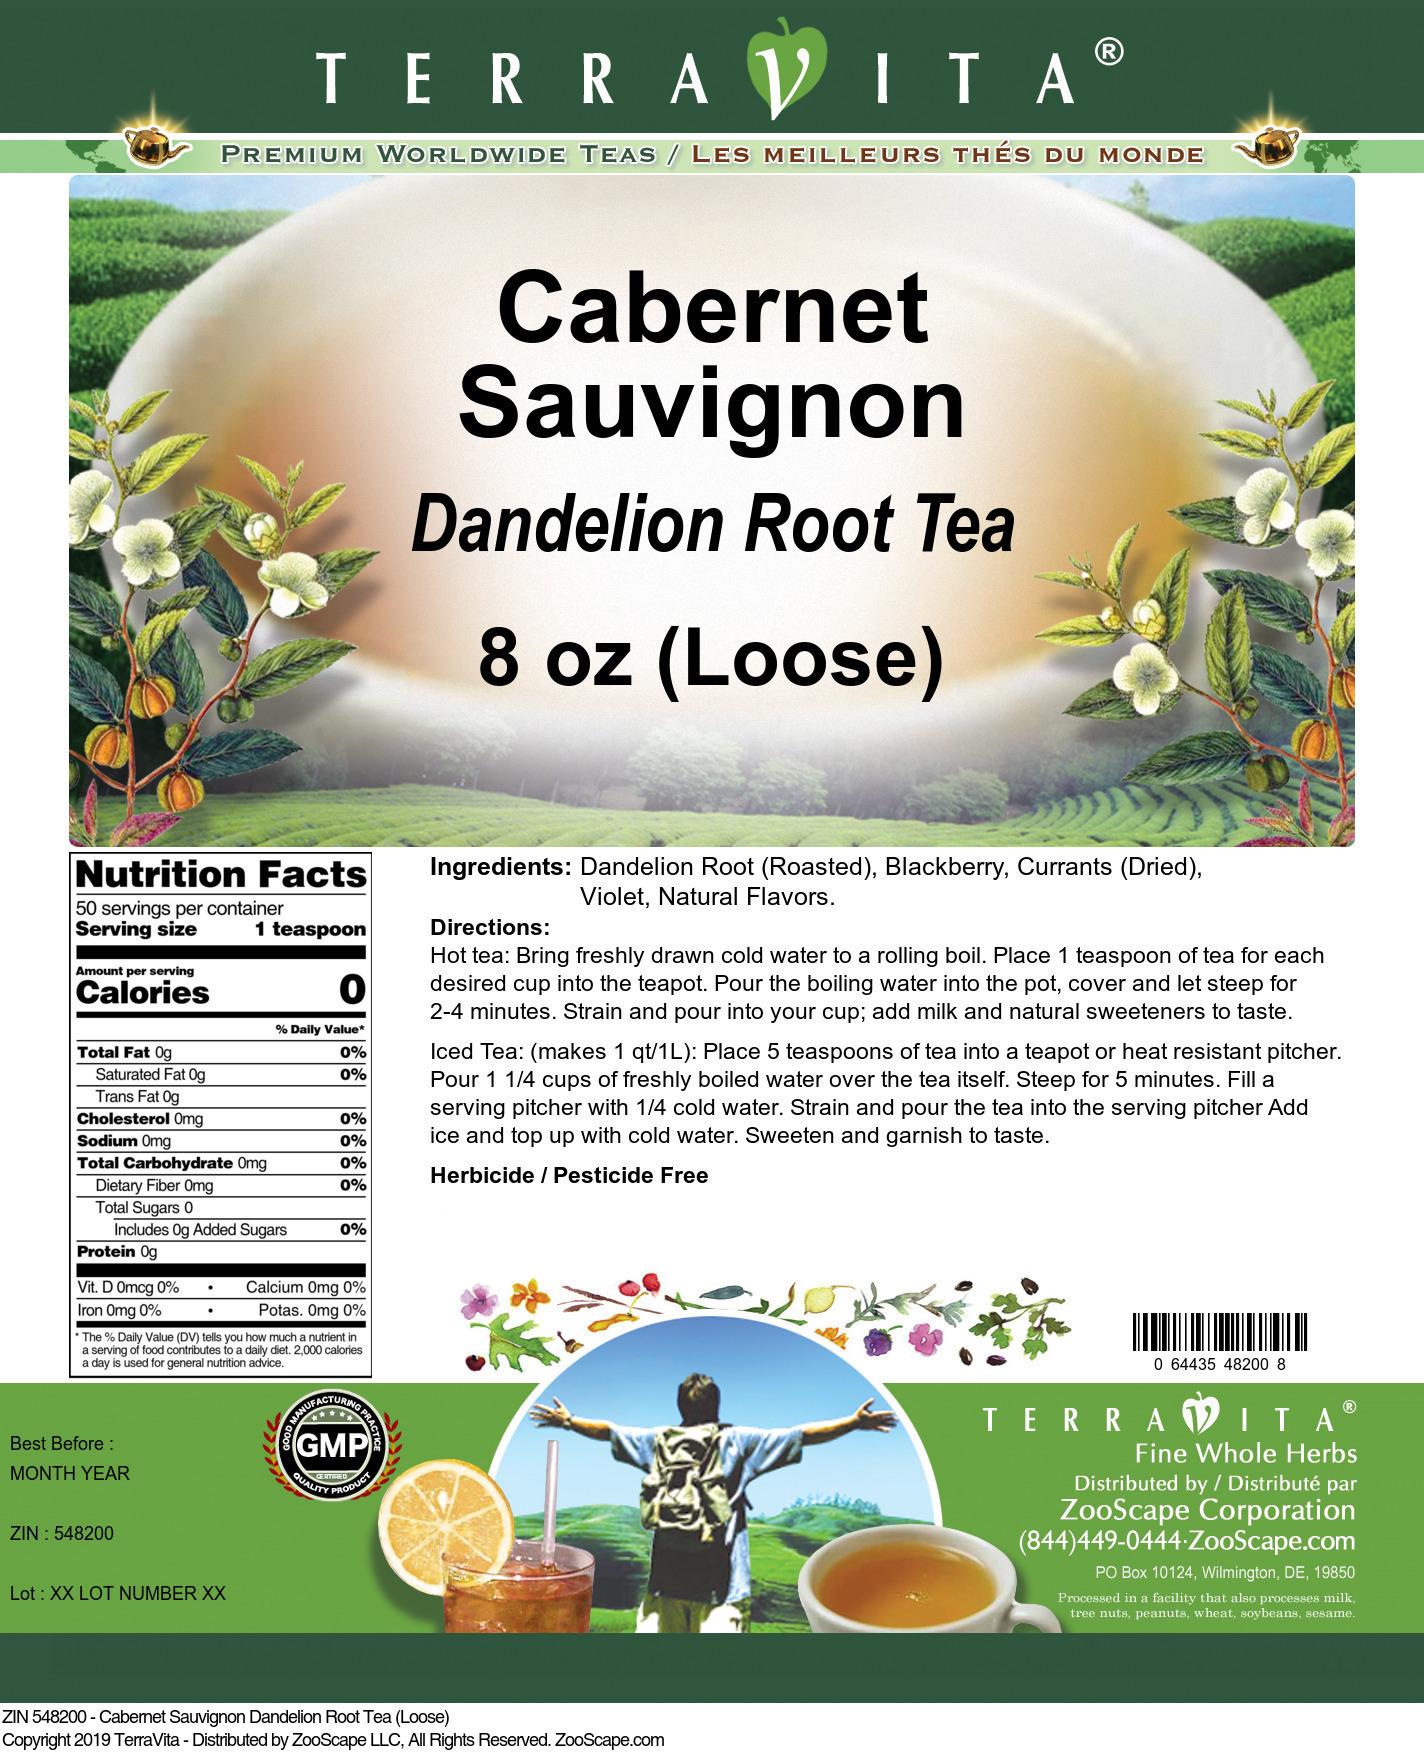 Cabernet Sauvignon Dandelion Root Tea (Loose)